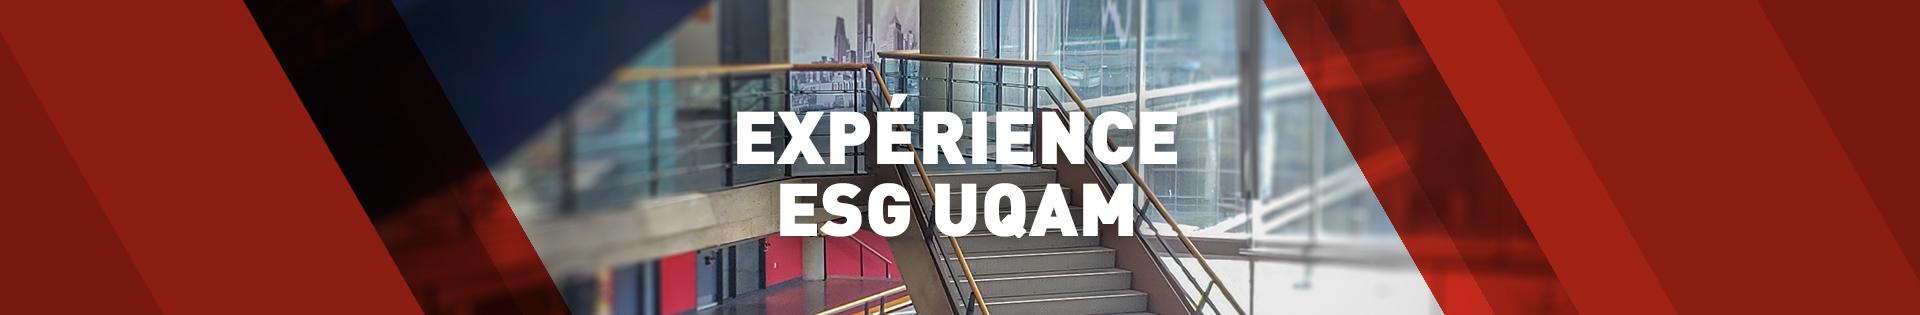 Expérience ESG UQAM